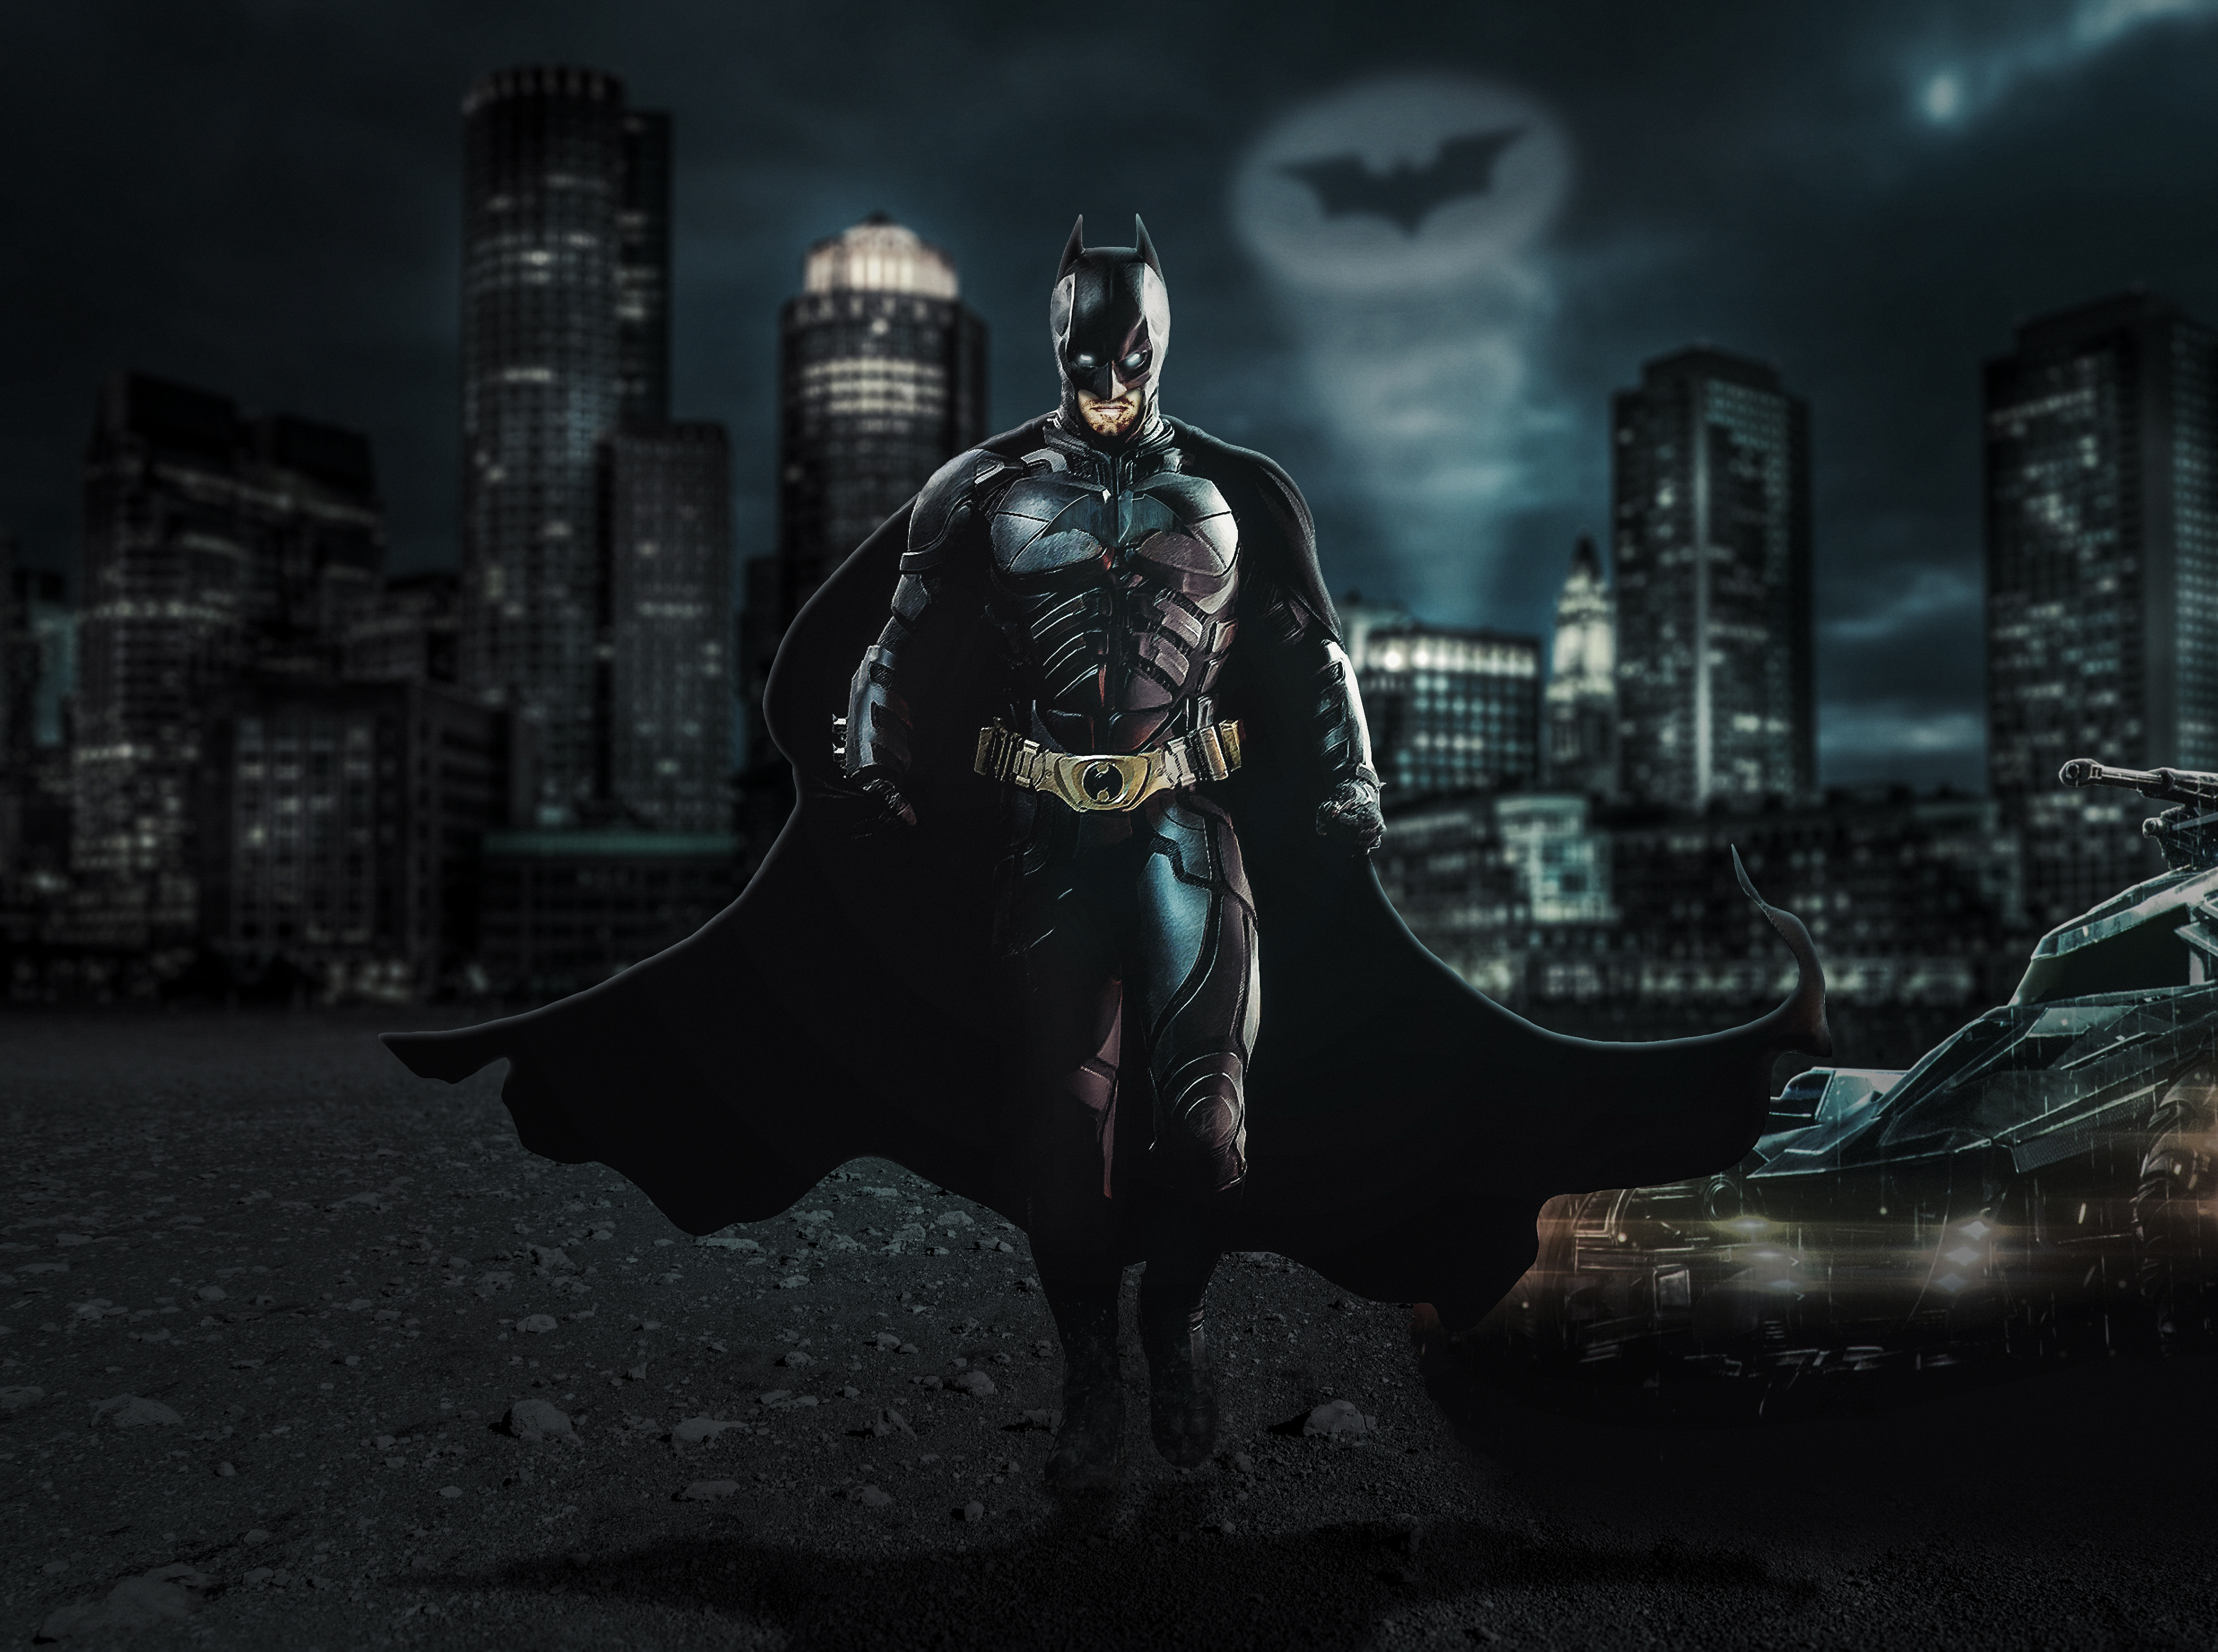 2048x1152 Batman The Dark Knight With Batmobile 4k 2048x1152